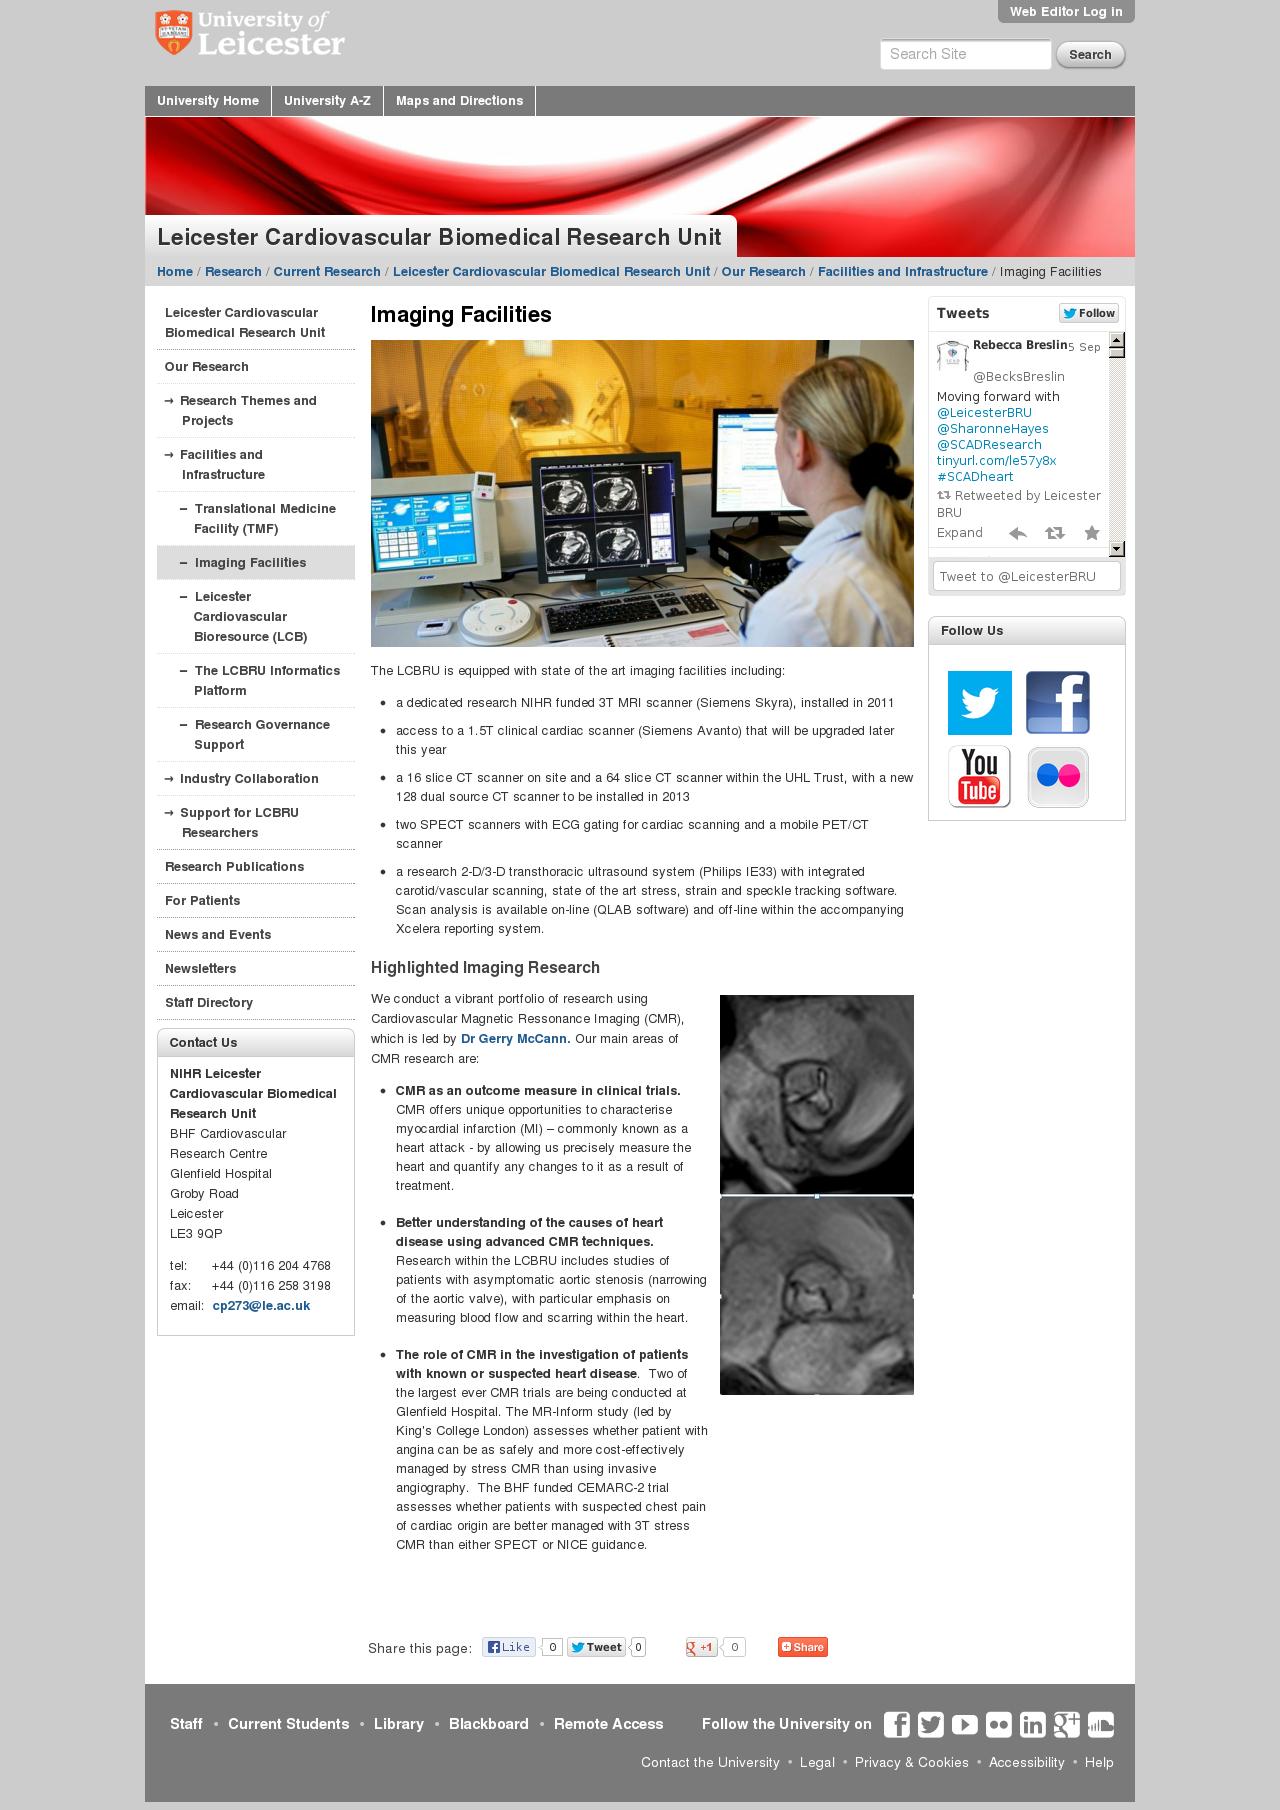 Website: facilities